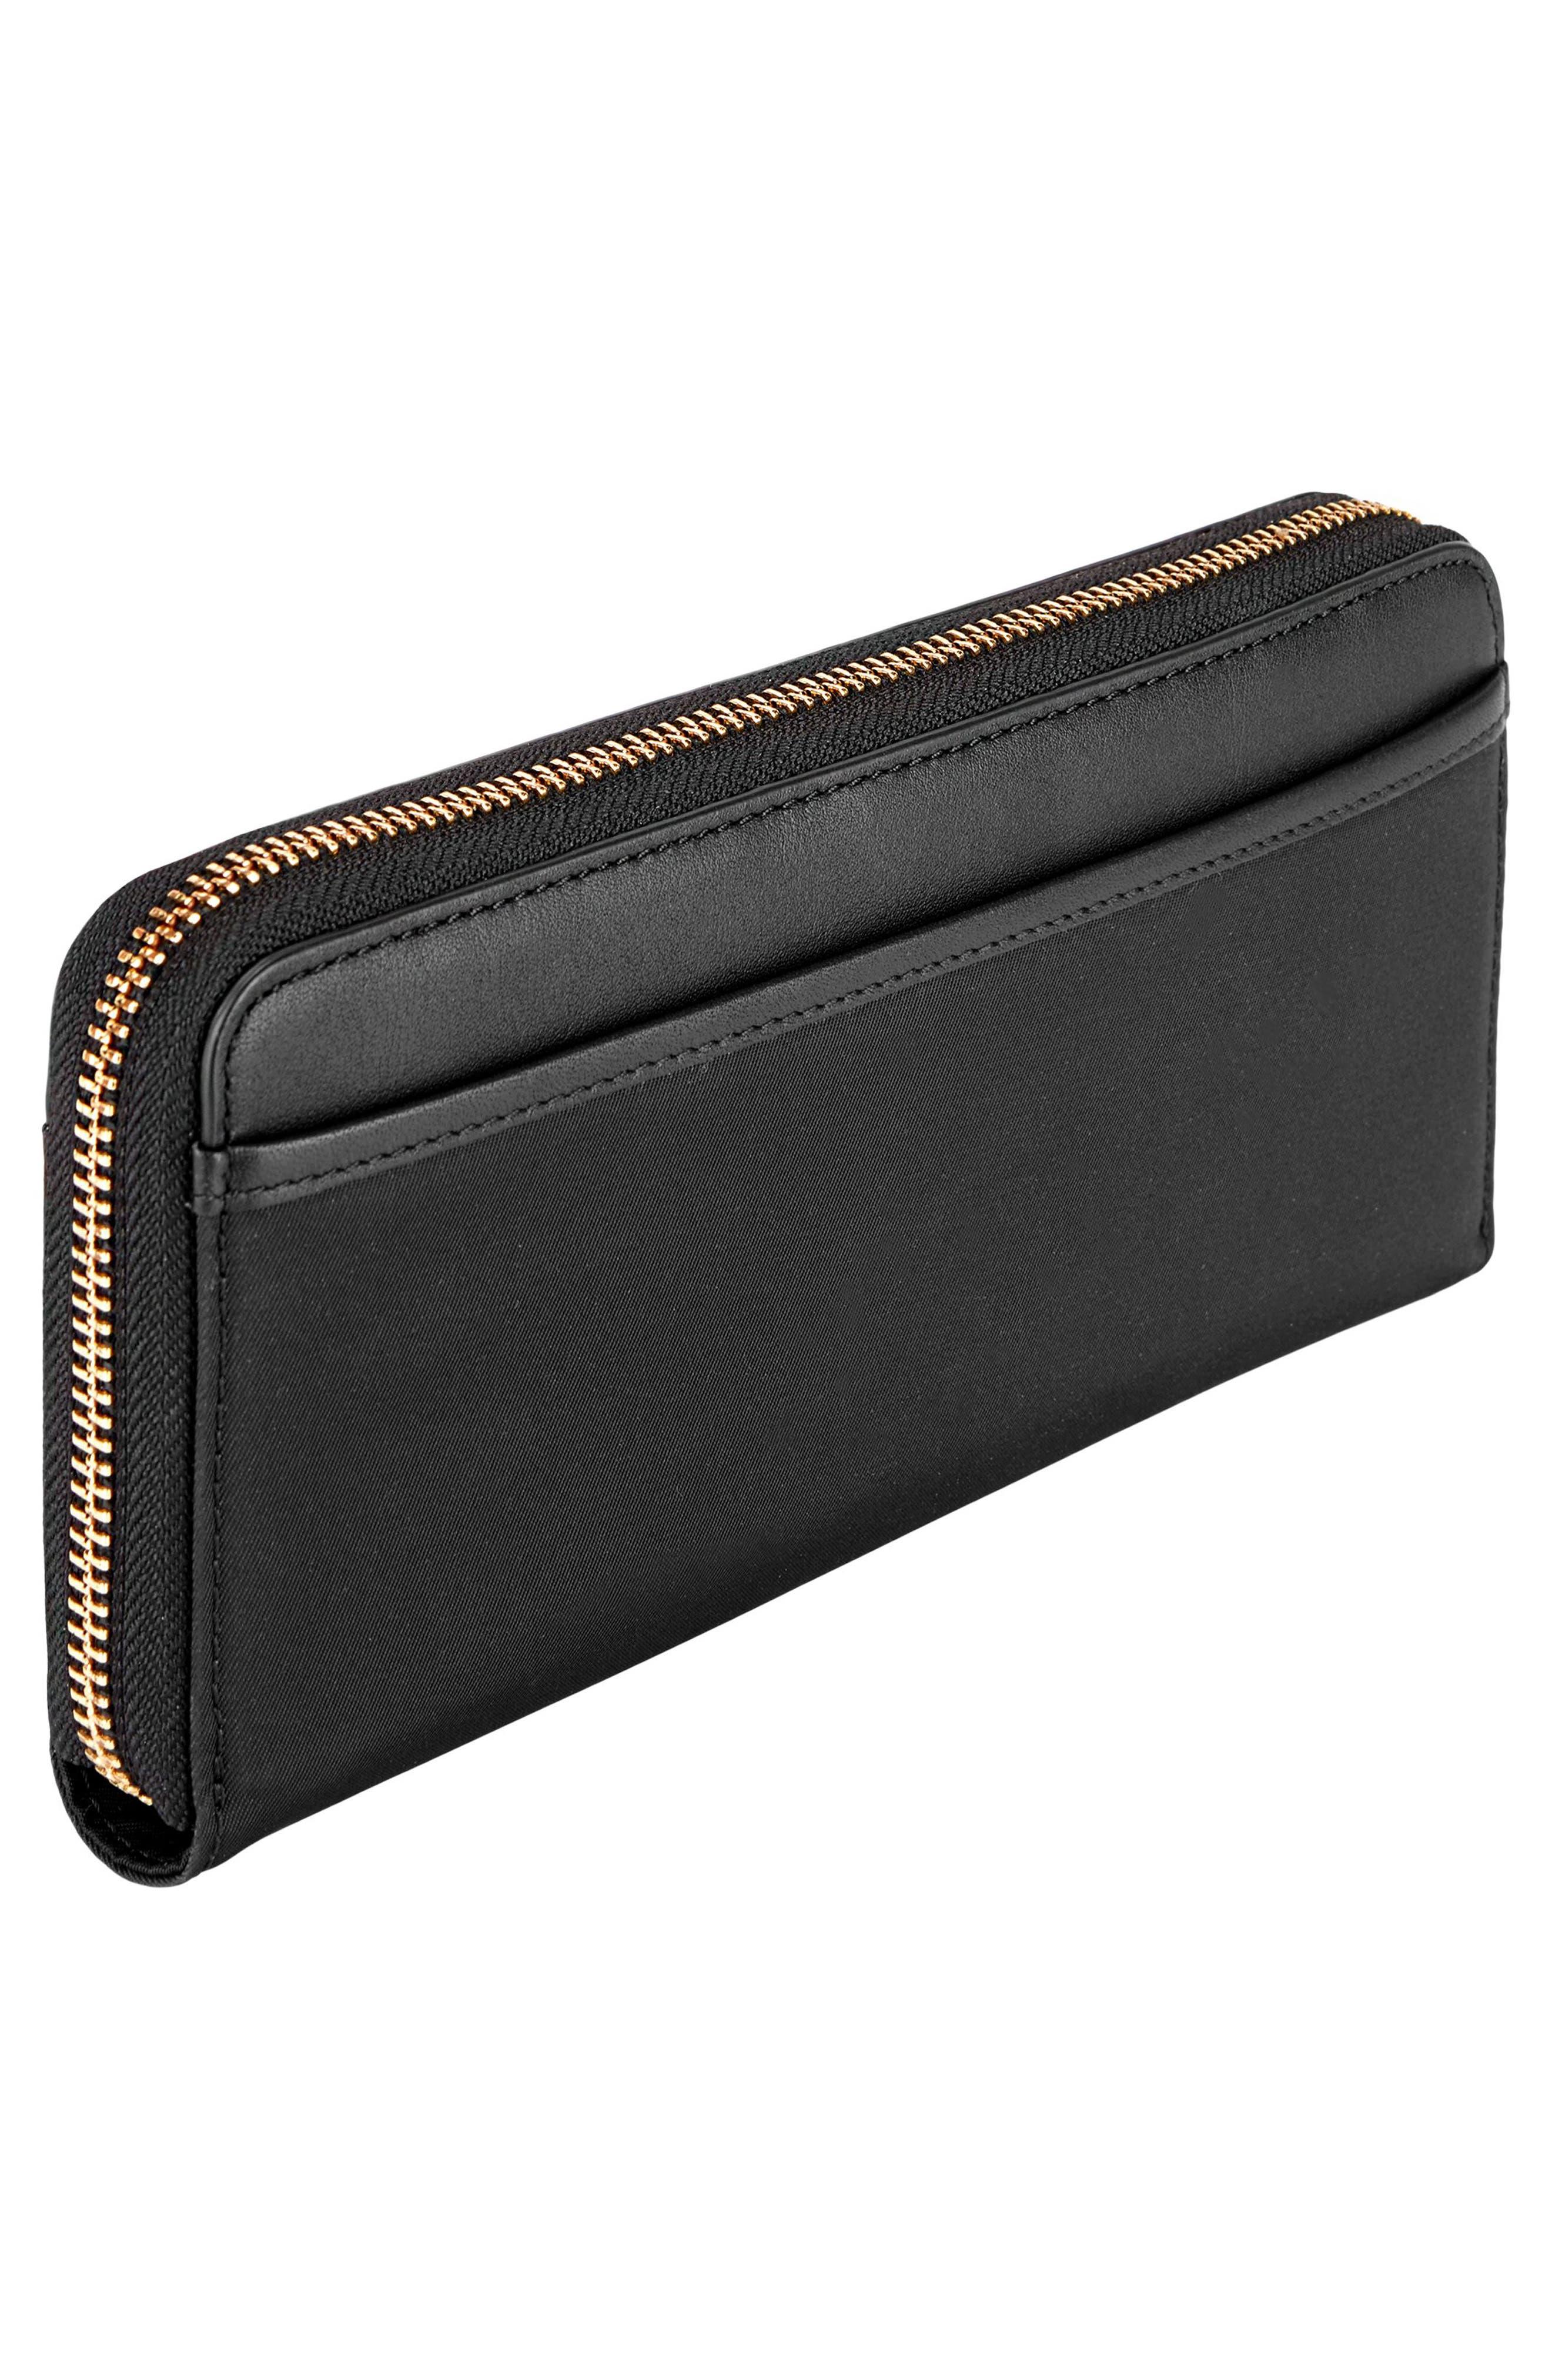 Continental Zip Tech Wallet,                             Alternate thumbnail 3, color,                             001